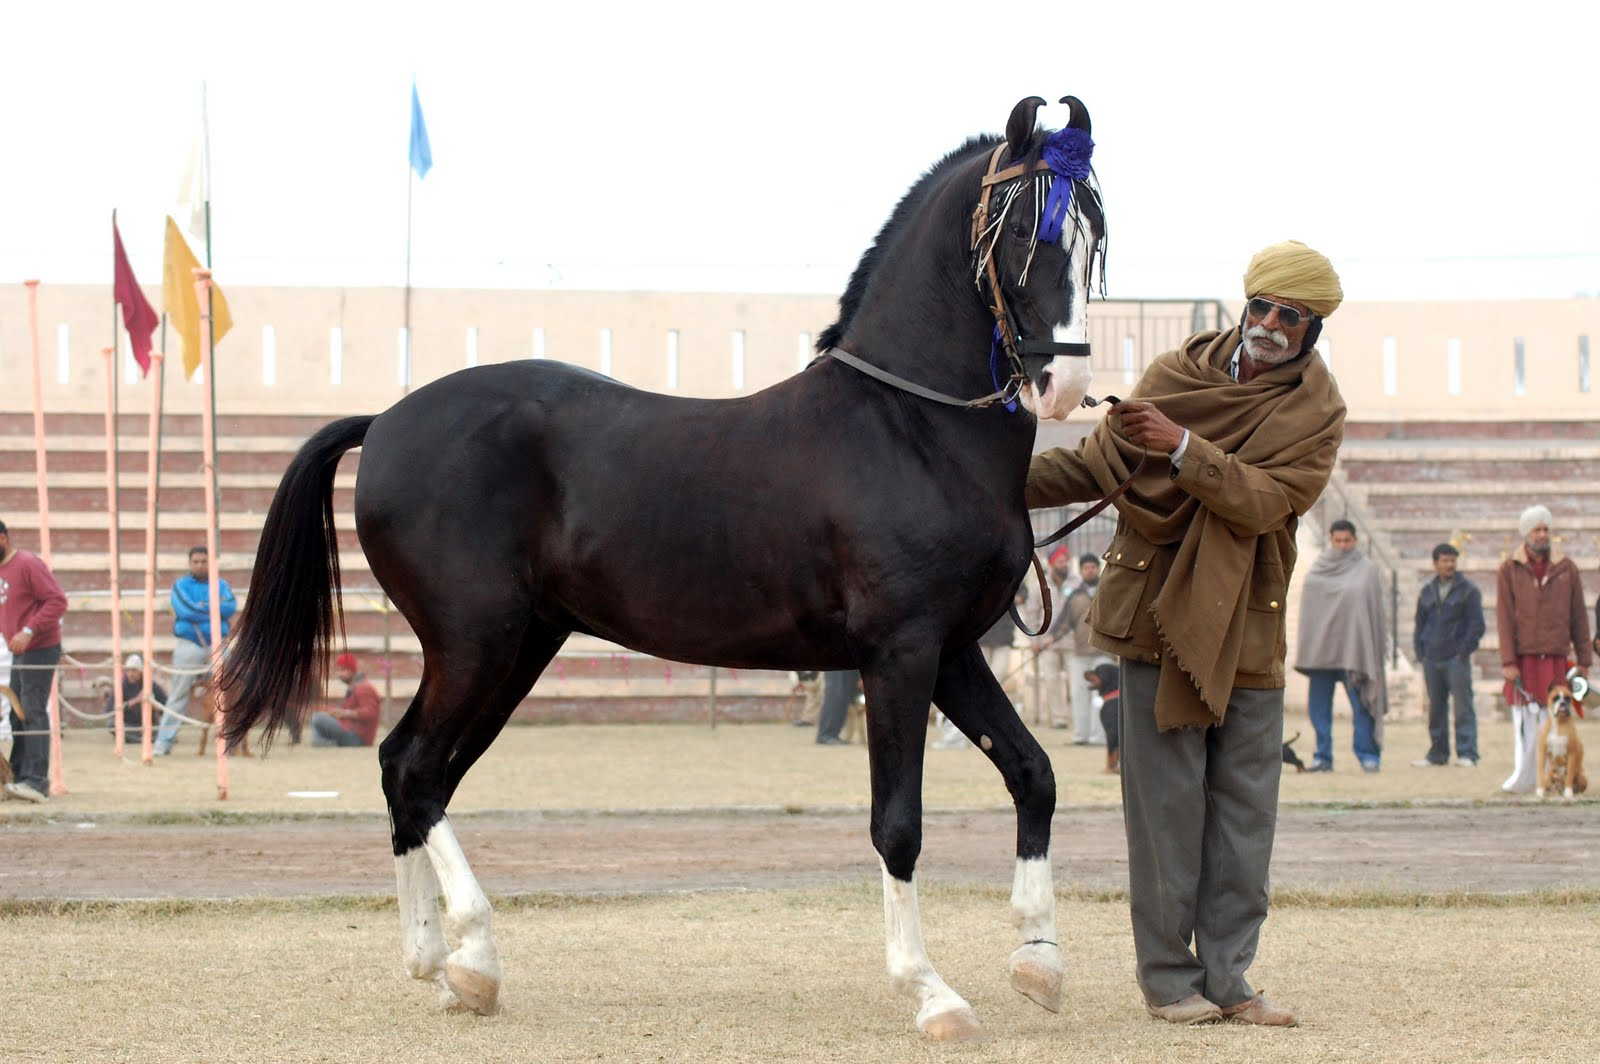 Marwari horse indigenous horses of india June 2010 1600x1064